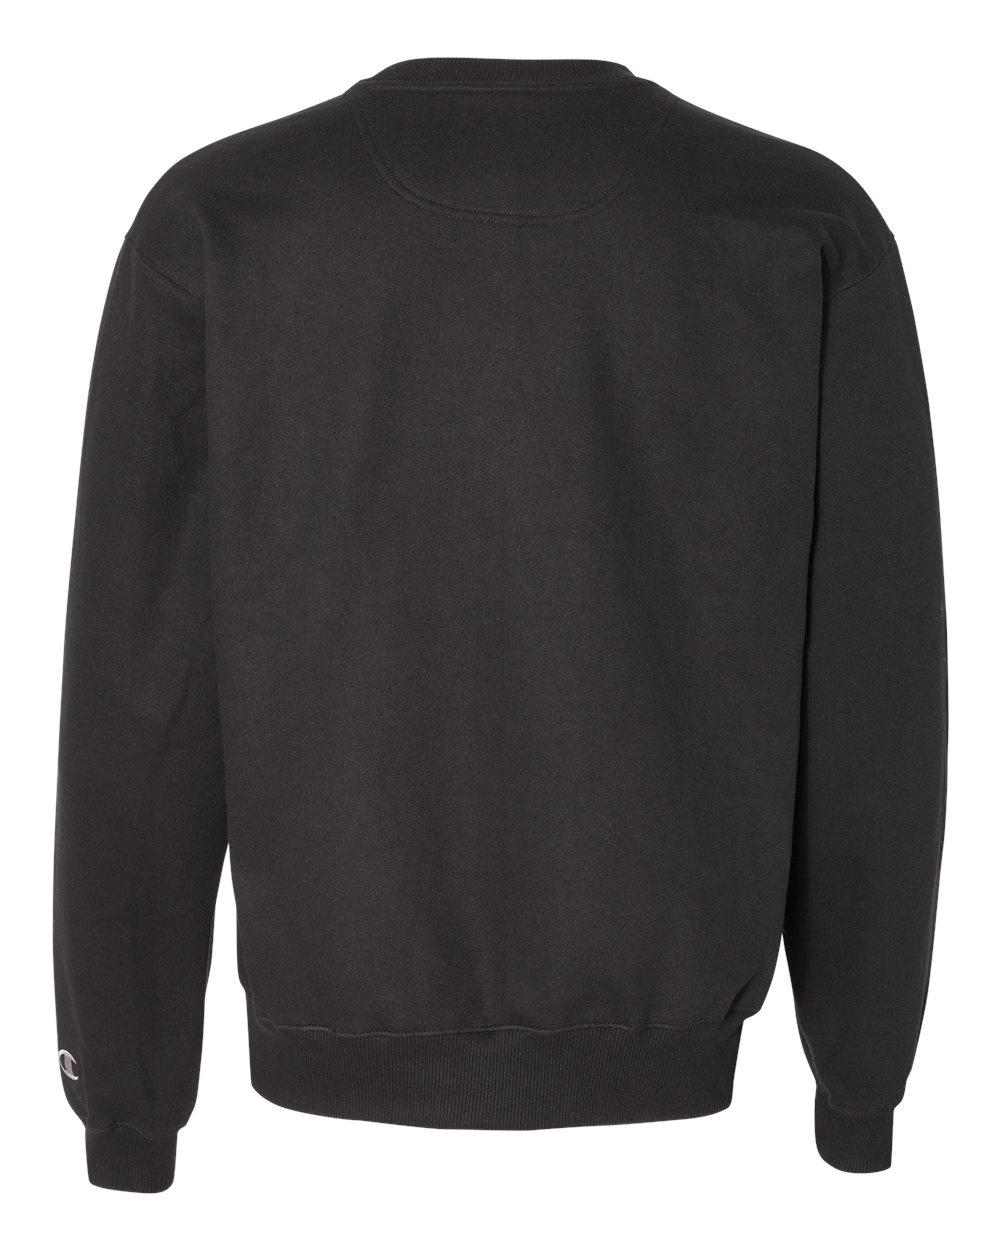 Champion-Mens-Cotton-Max-Crewneck-Sweatshirt-Pullover-S178-up-to-3XL miniature 7